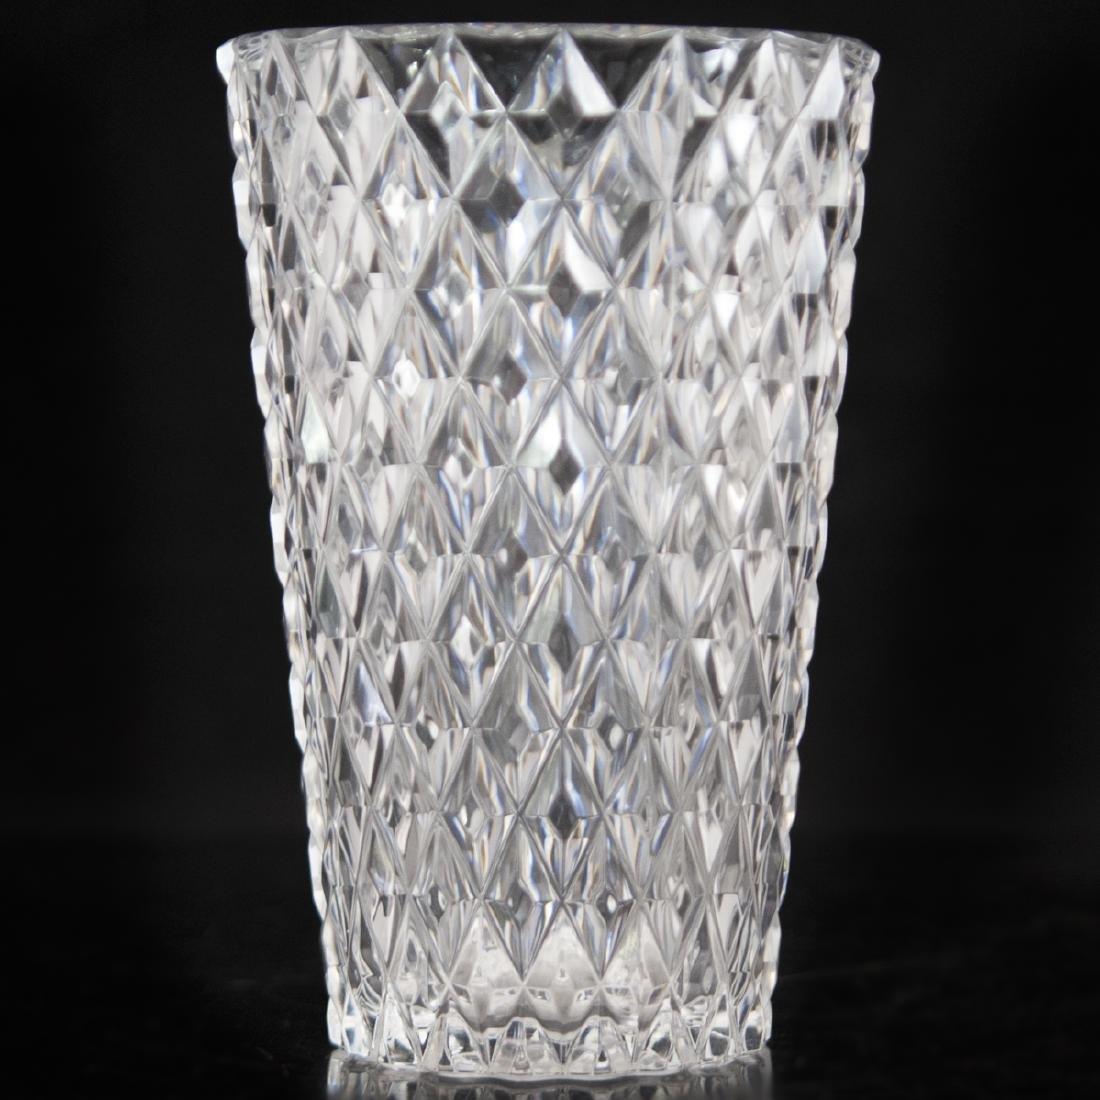 Val St Lambert Crystal Vase